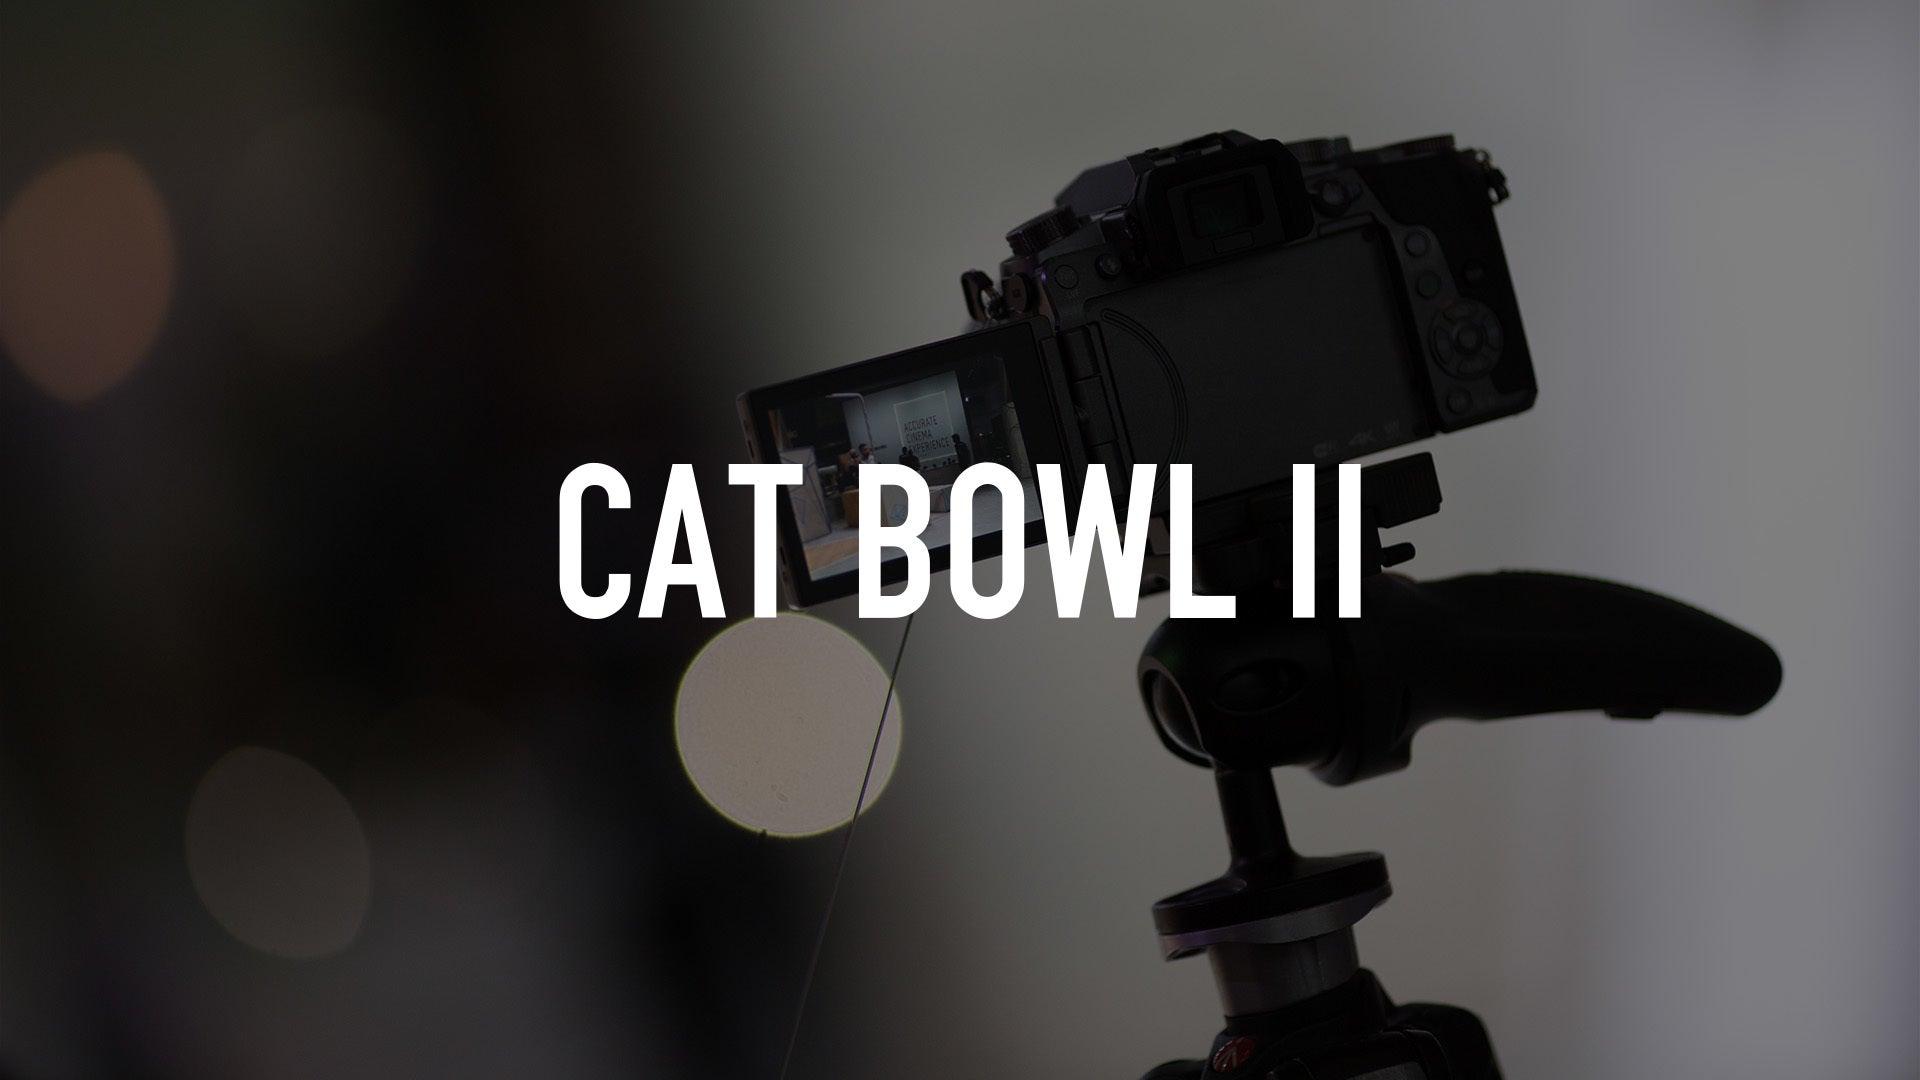 Cat Bowl II